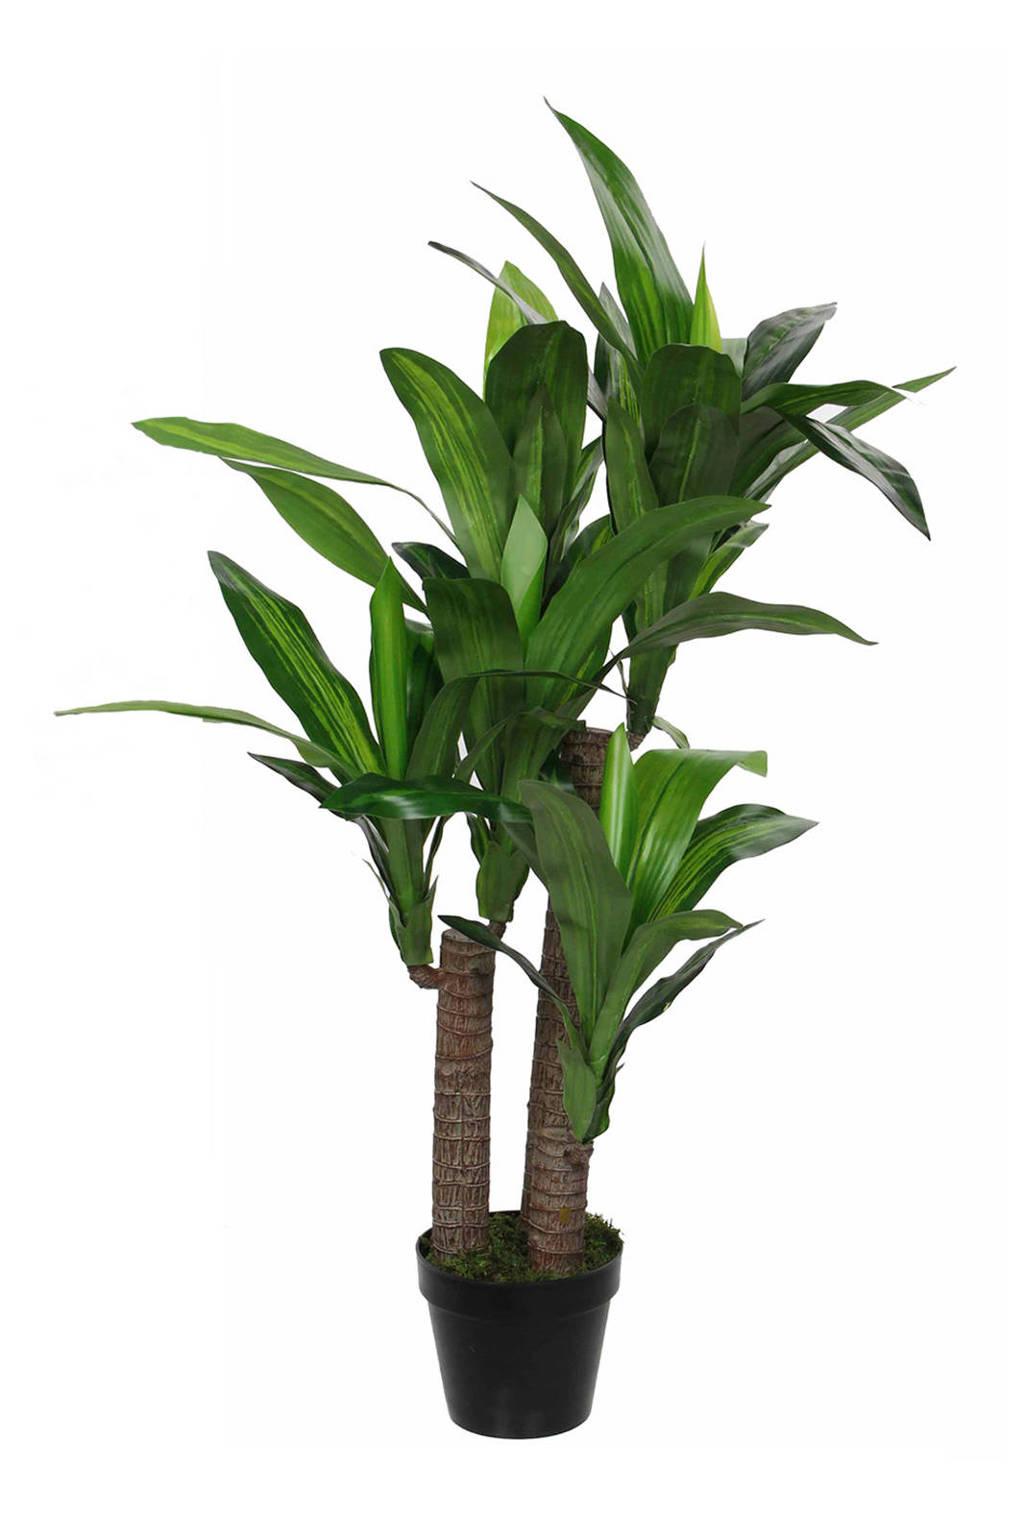 Mica kunstplant Dracaena (h110 cm), Groen/zwart